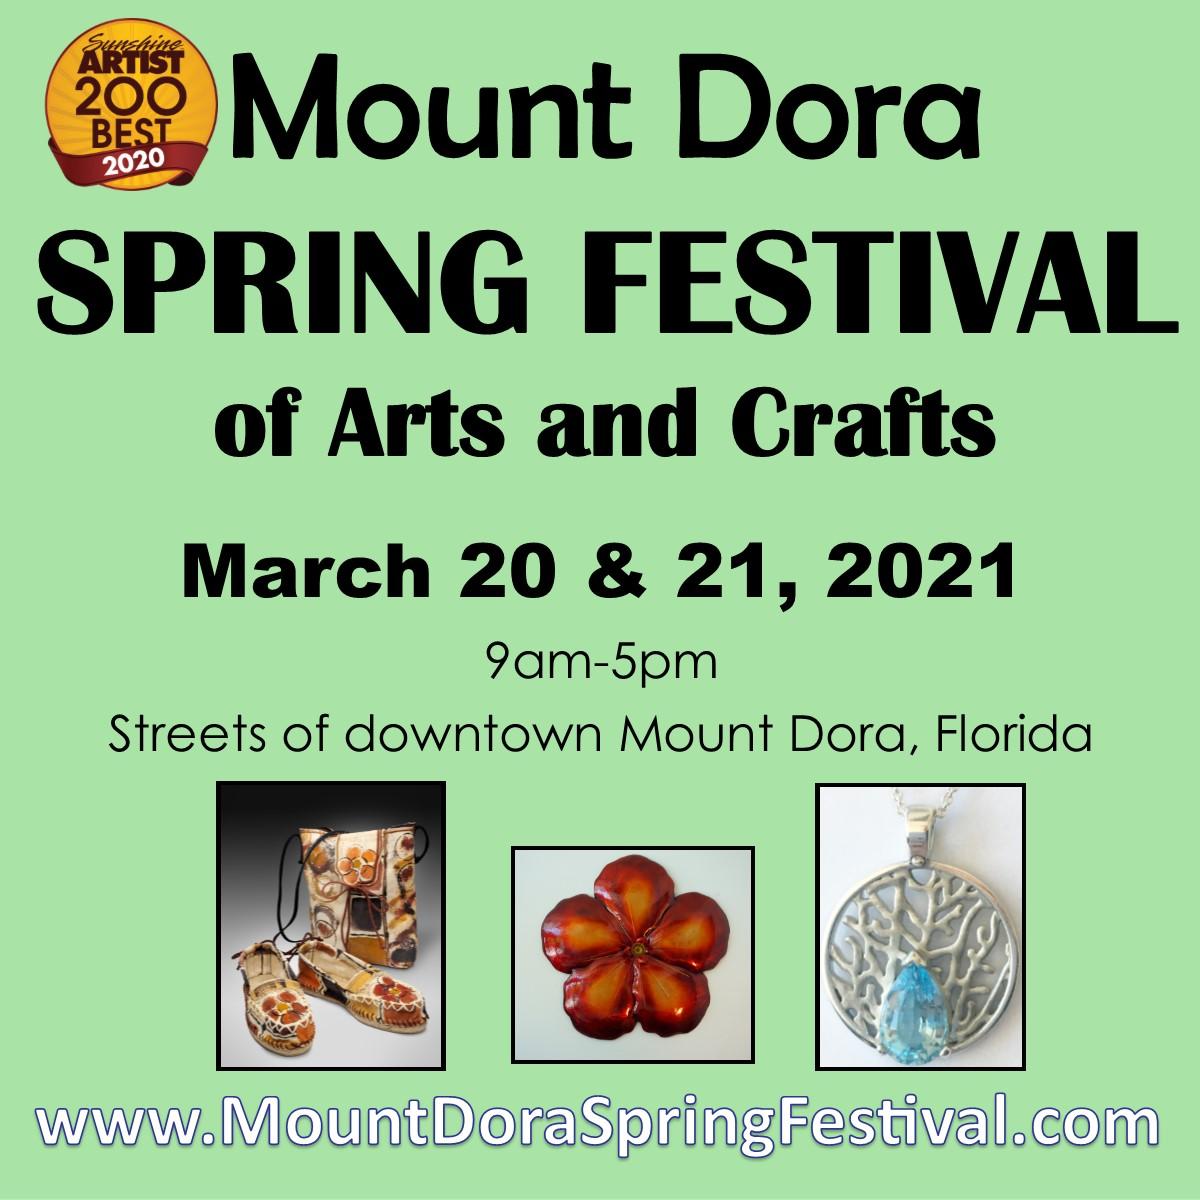 Mount Dora Spring Festival Square 2021